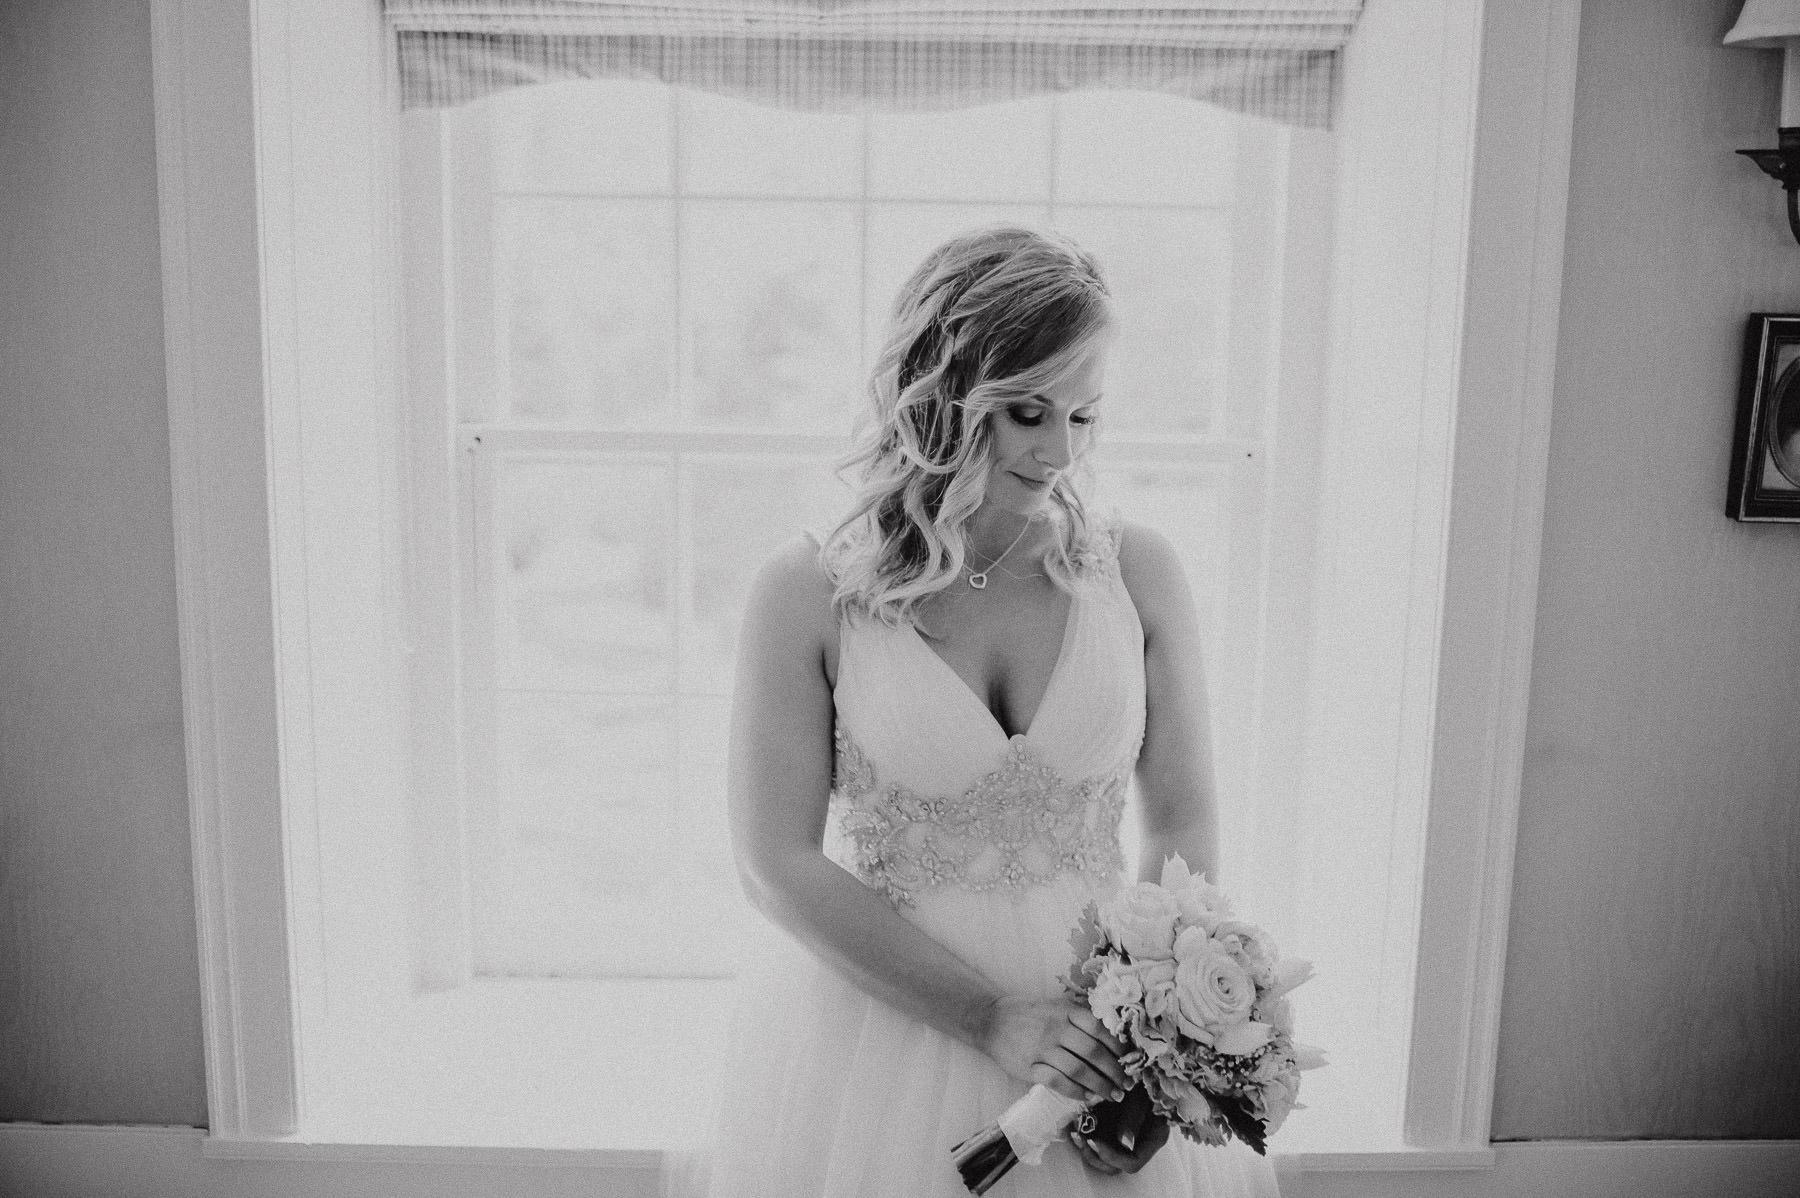 appleford-estate-wedding-photography-21.jpg